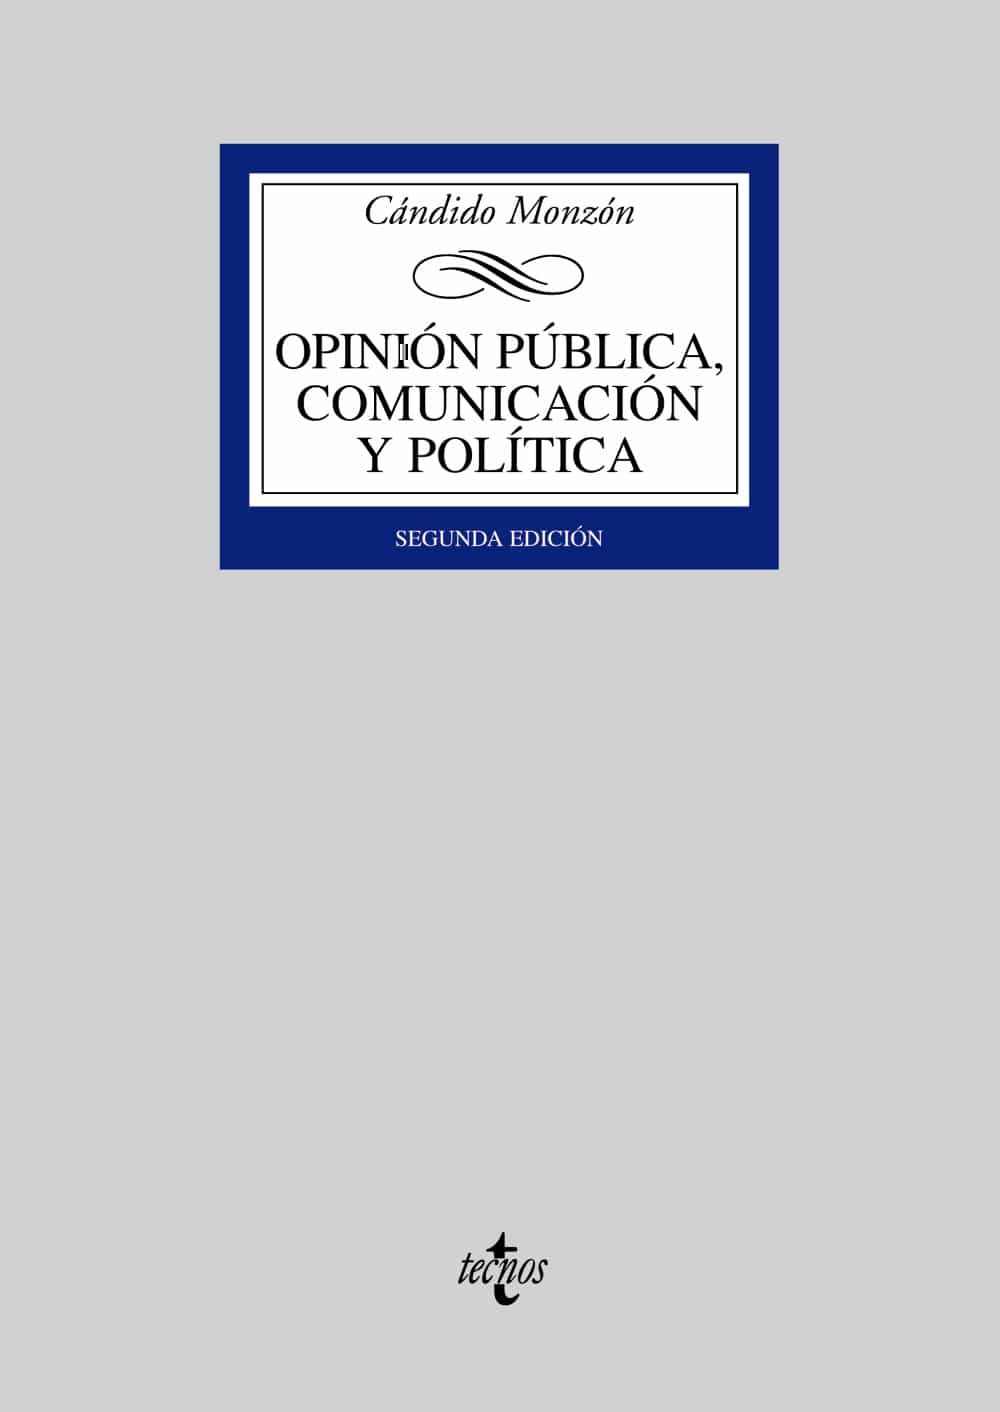 Opinion Publica, Comunicacion Y Politica (2ª Ed.) por Candido Monzon